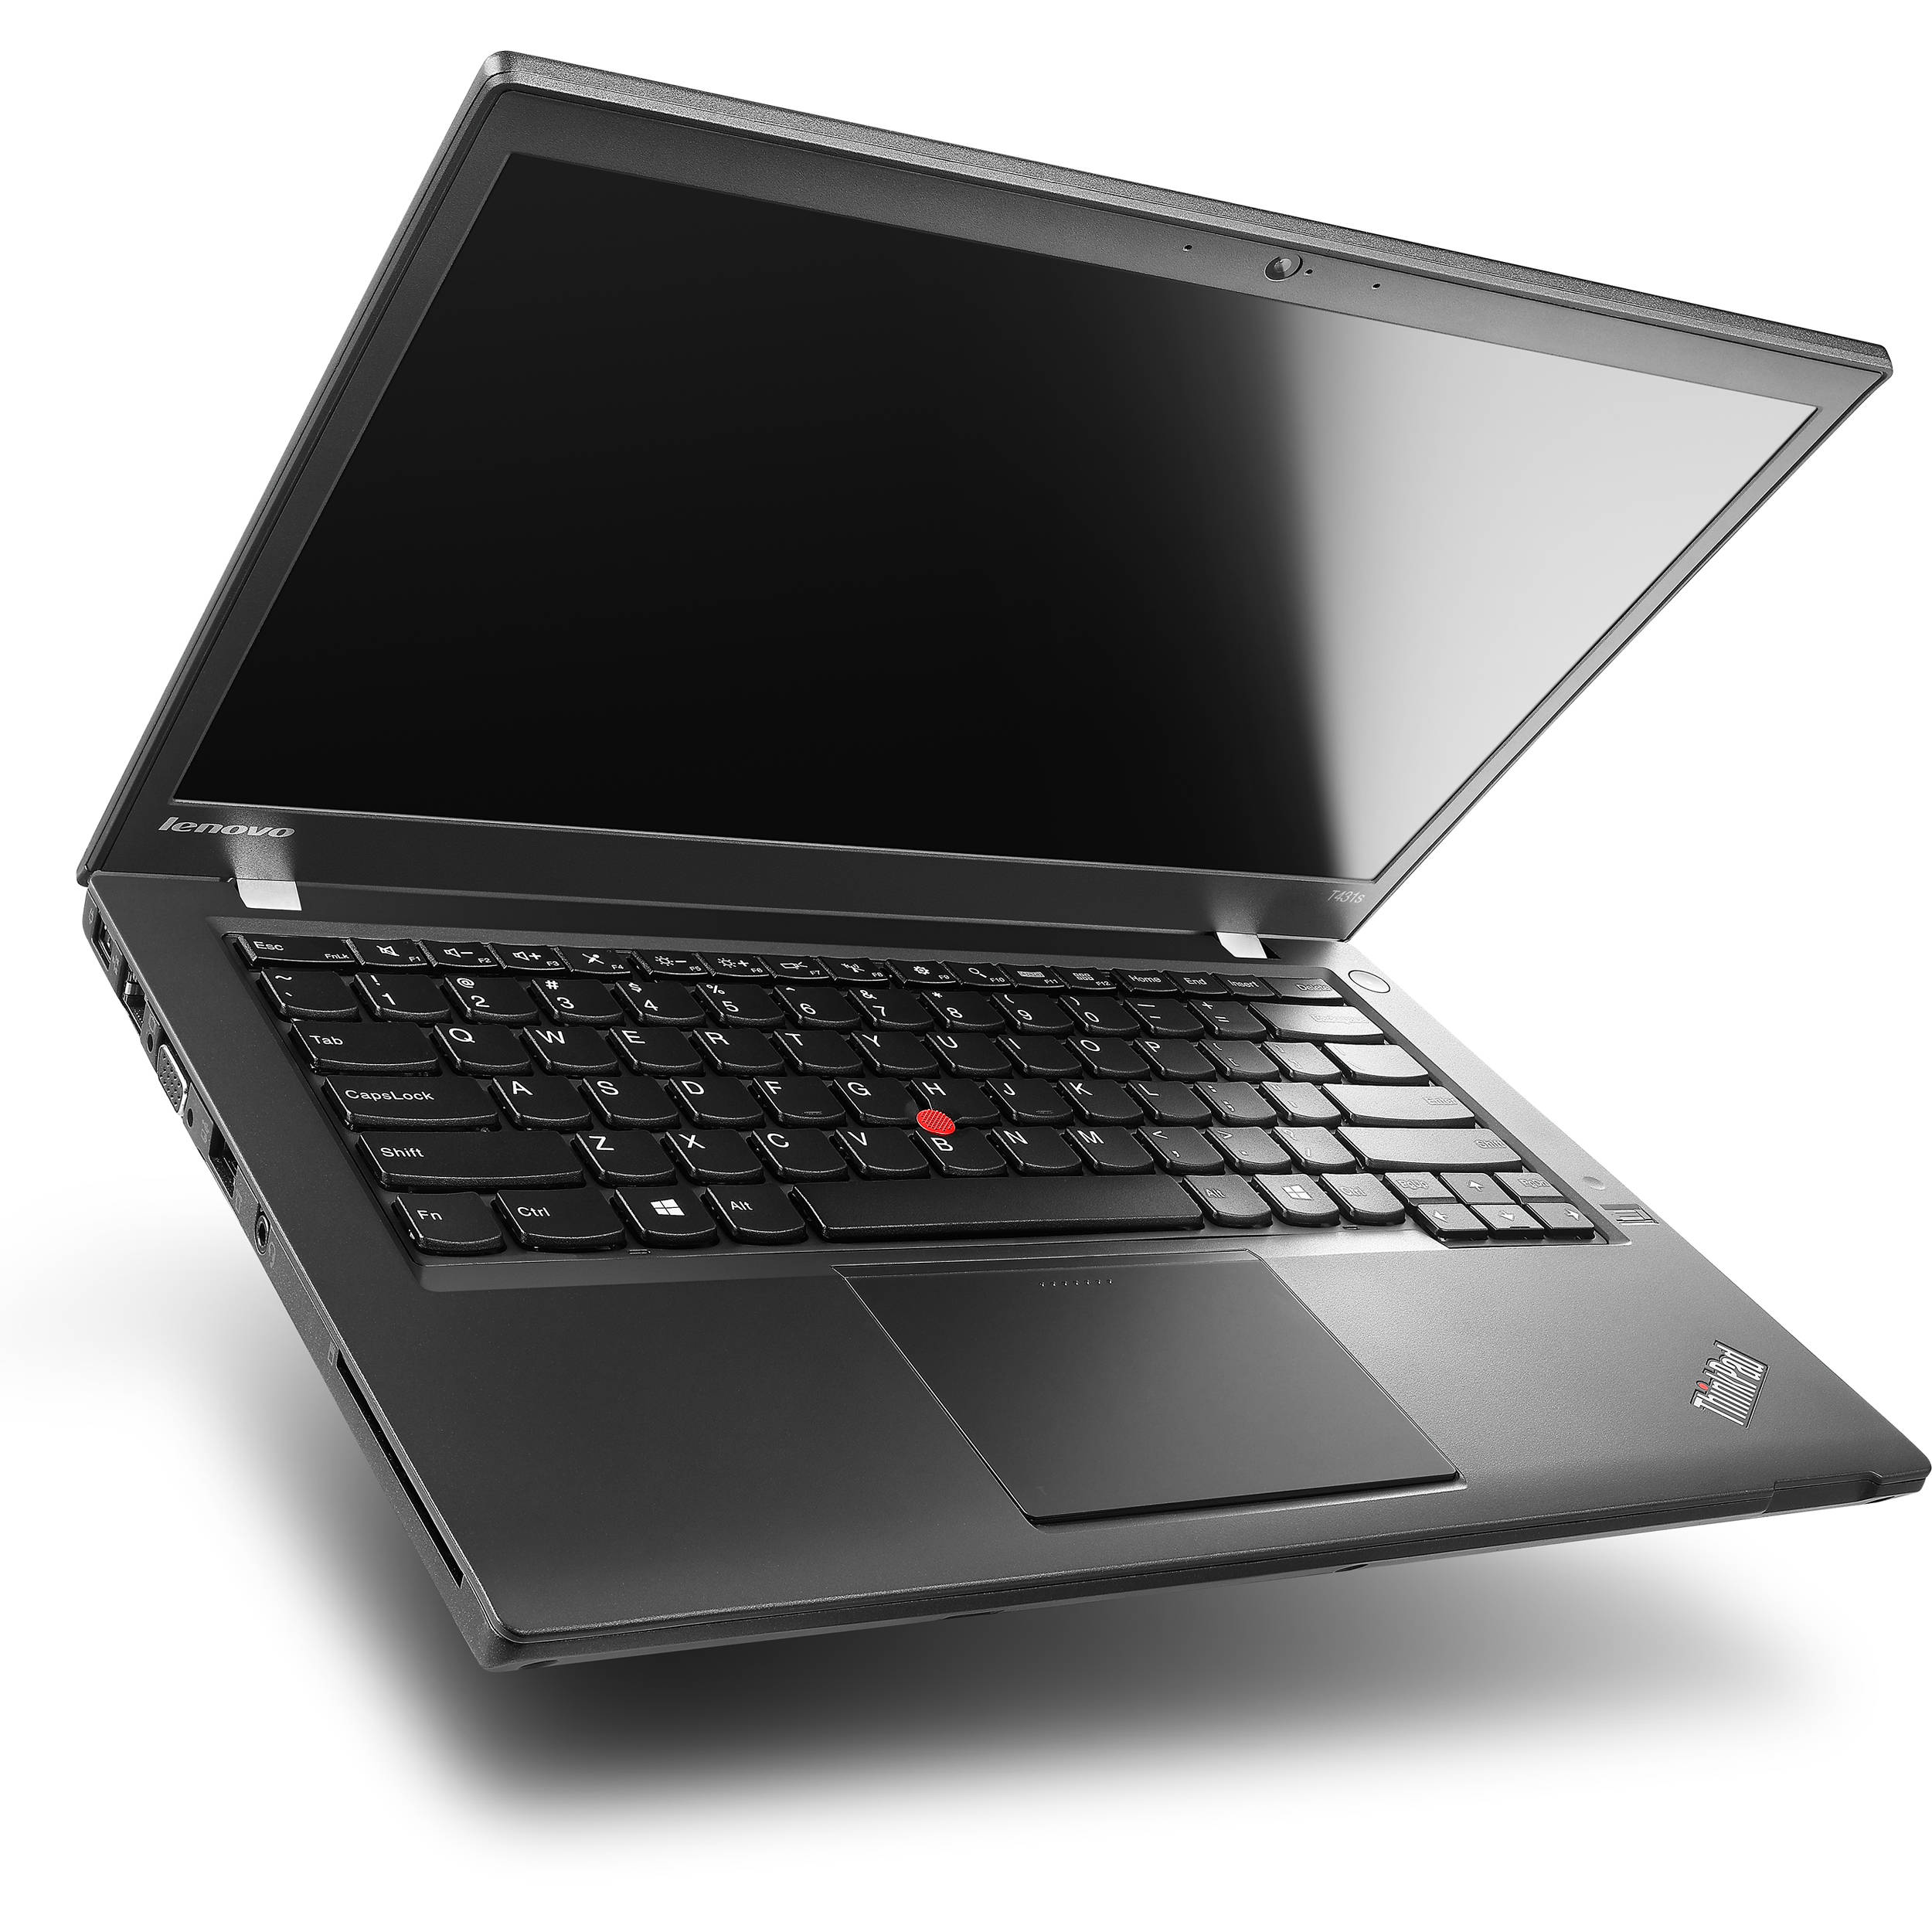 Lenovo ThinkPad T431s Power Management Driver